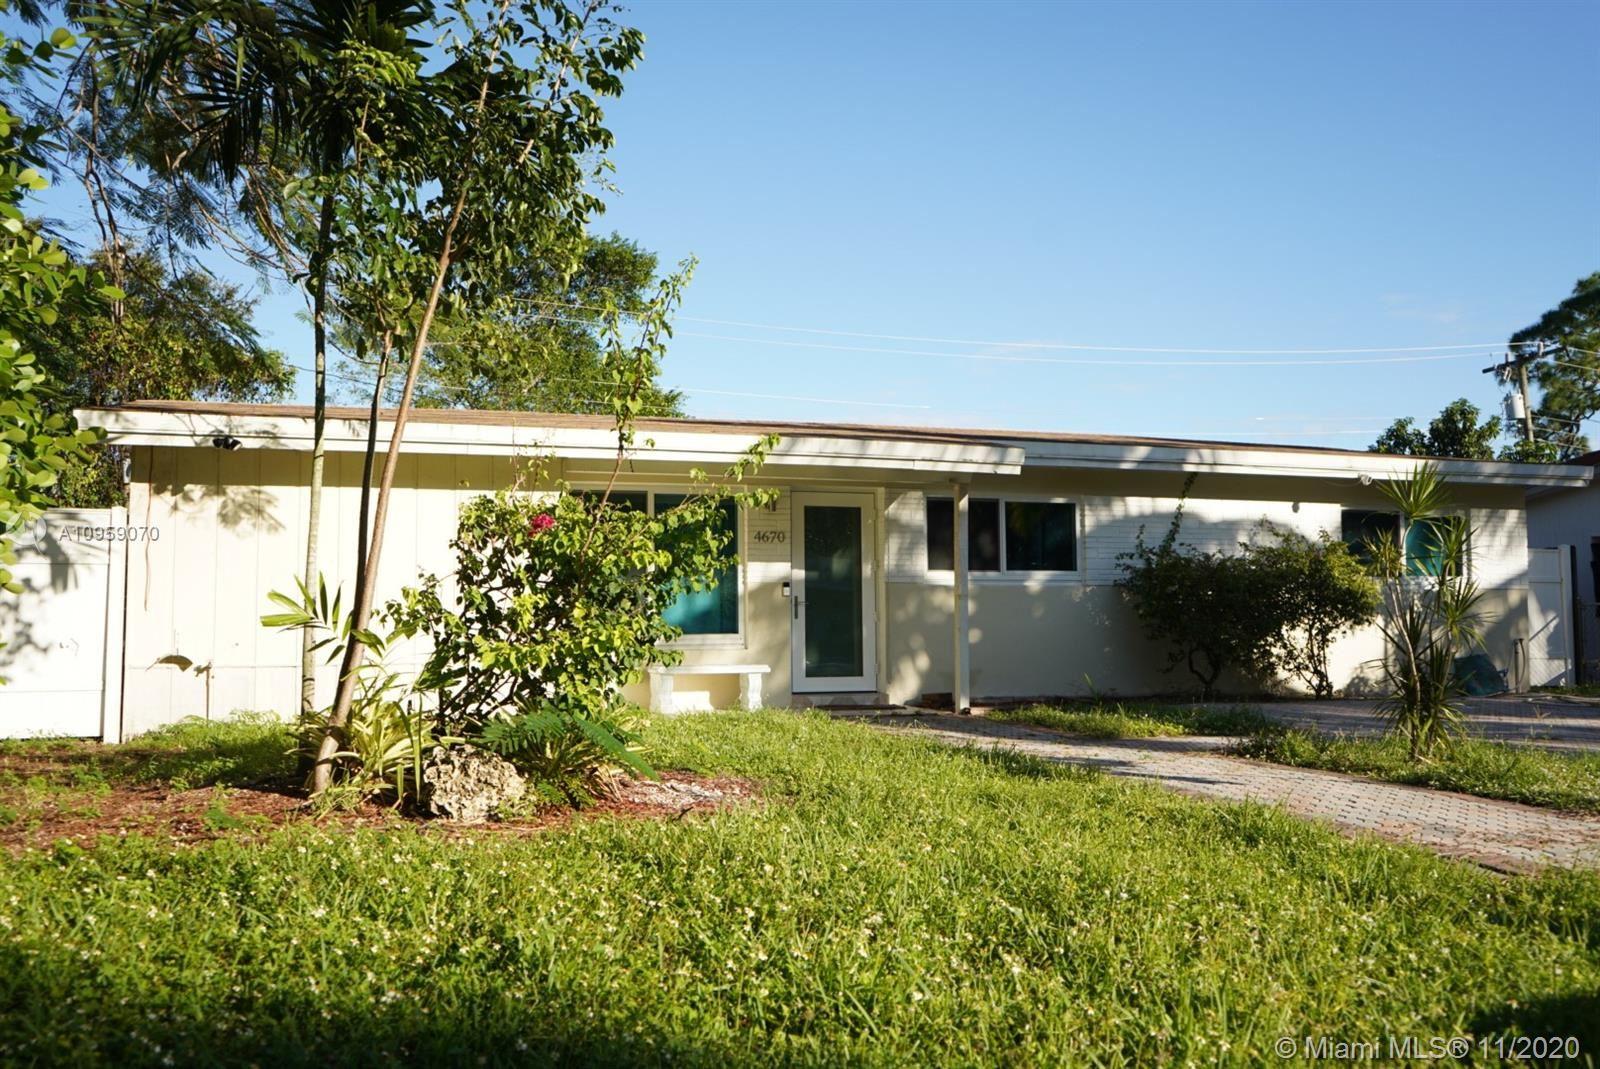 Photo of 4670 SW 25th Ave, Dania Beach, FL 33312 (MLS # A10959070)